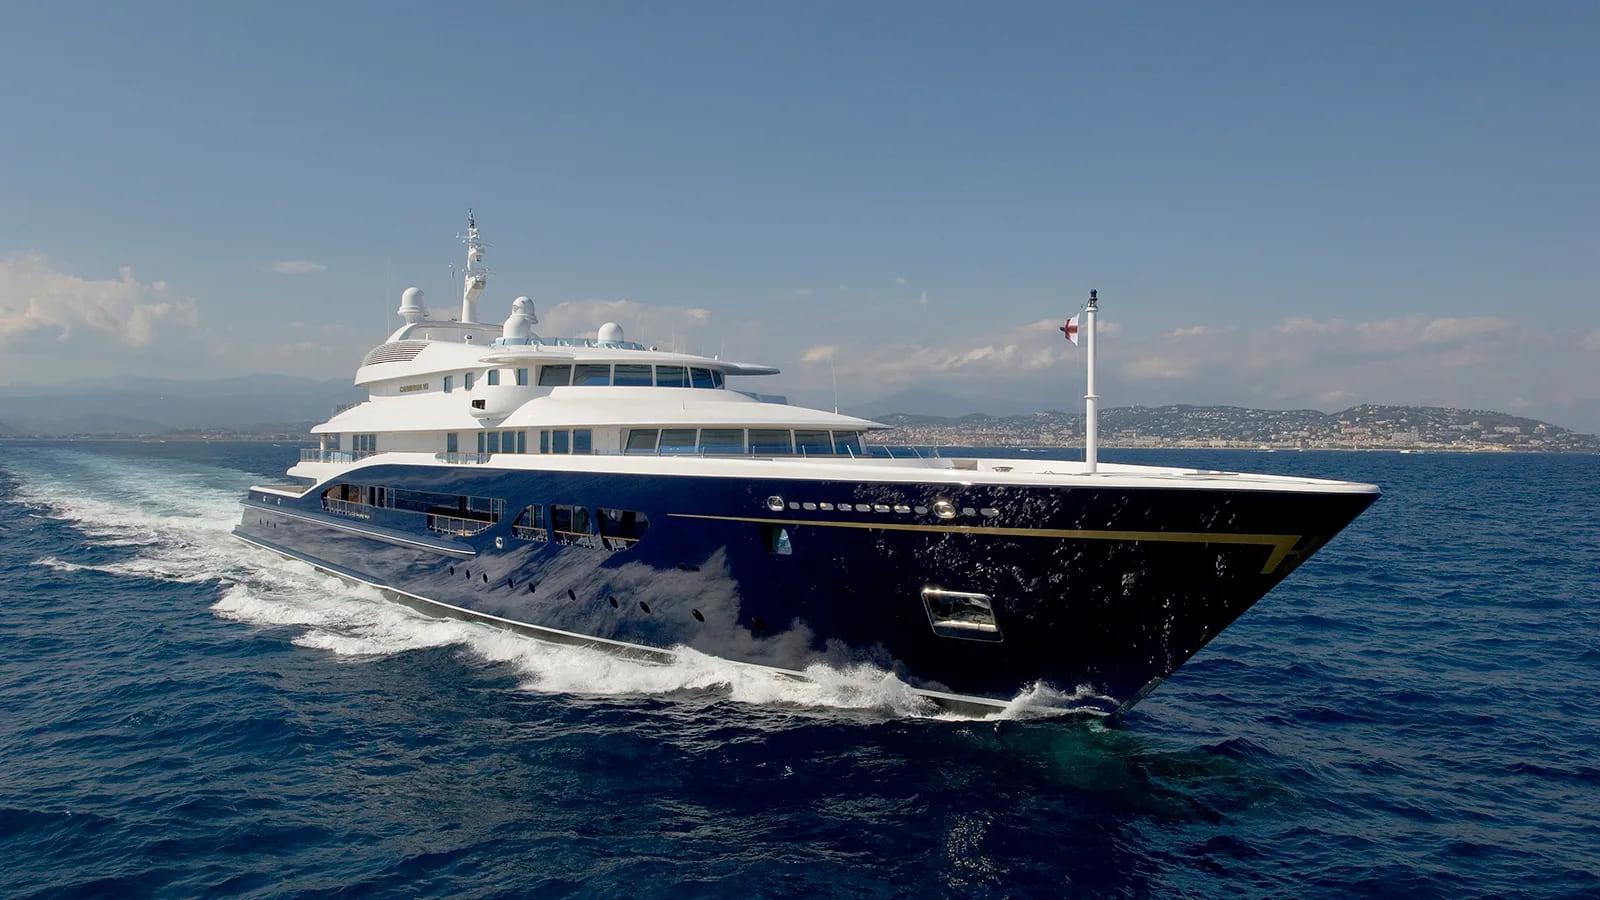 carinthia-VII-boat-shopping-3